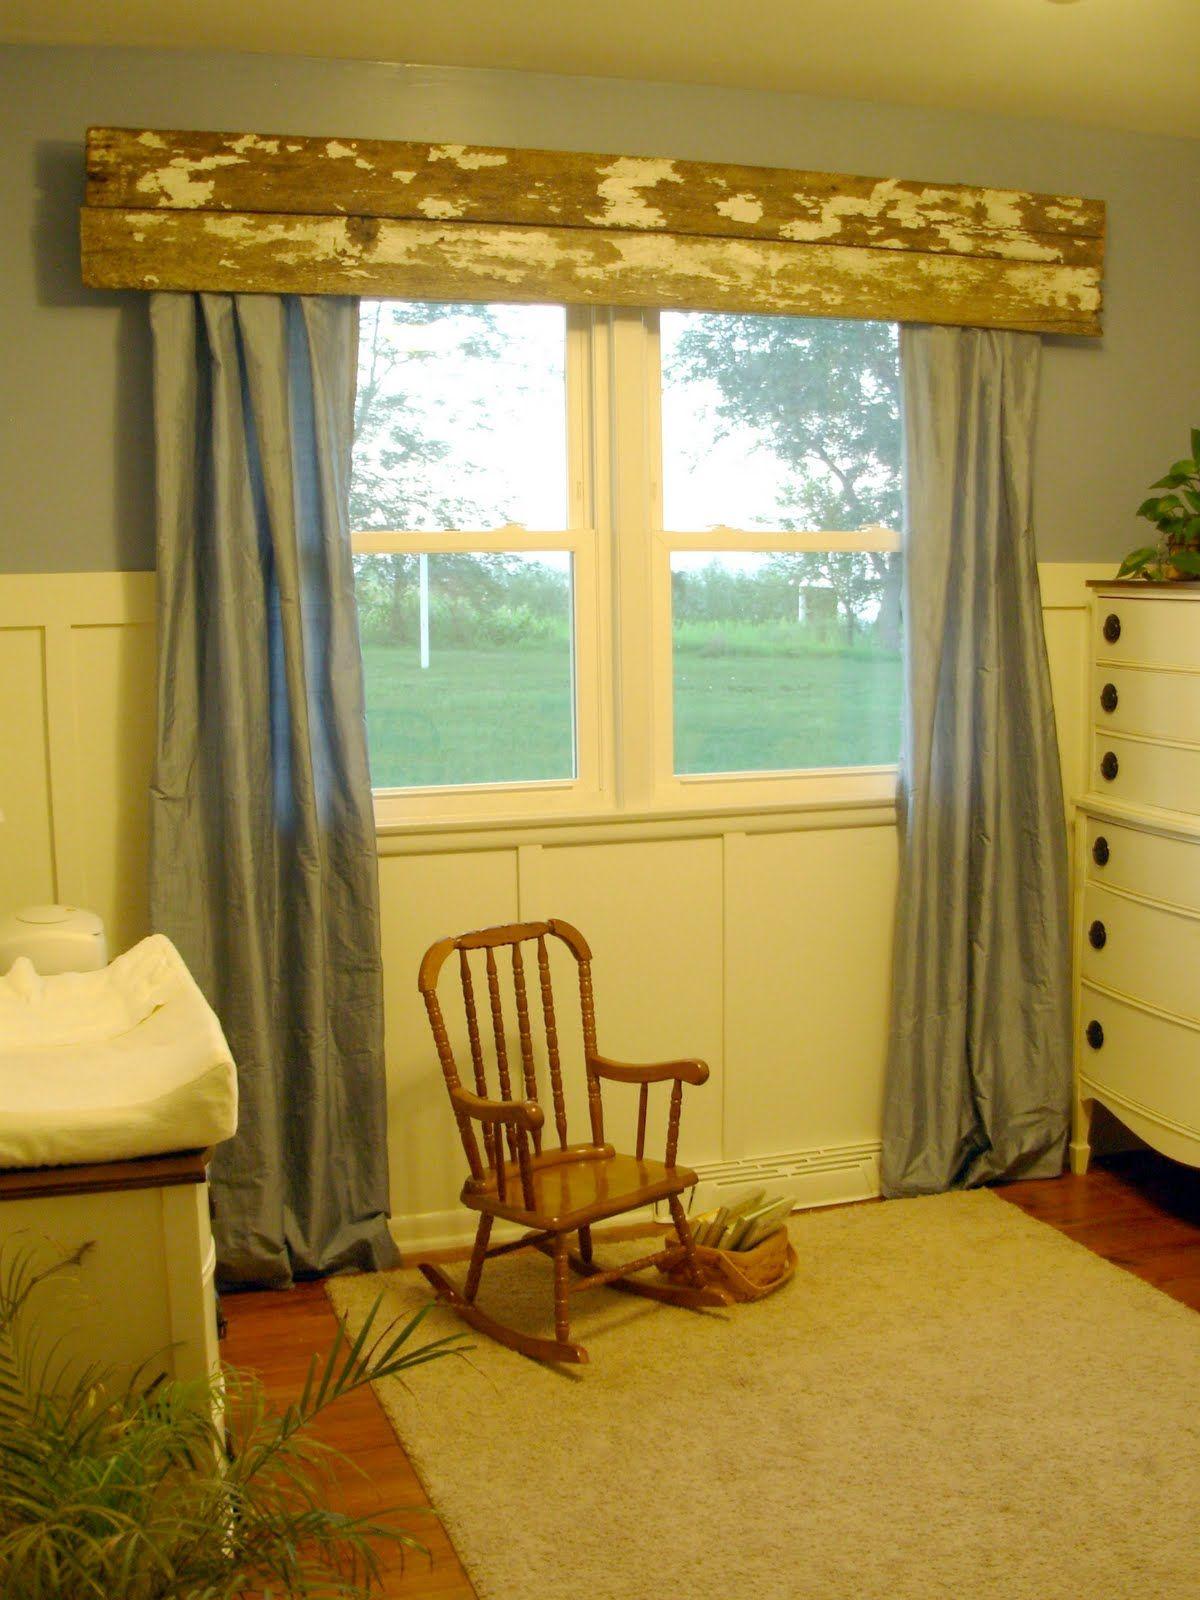 Above window decor  rustic window treatment would look good in ryneus room he already